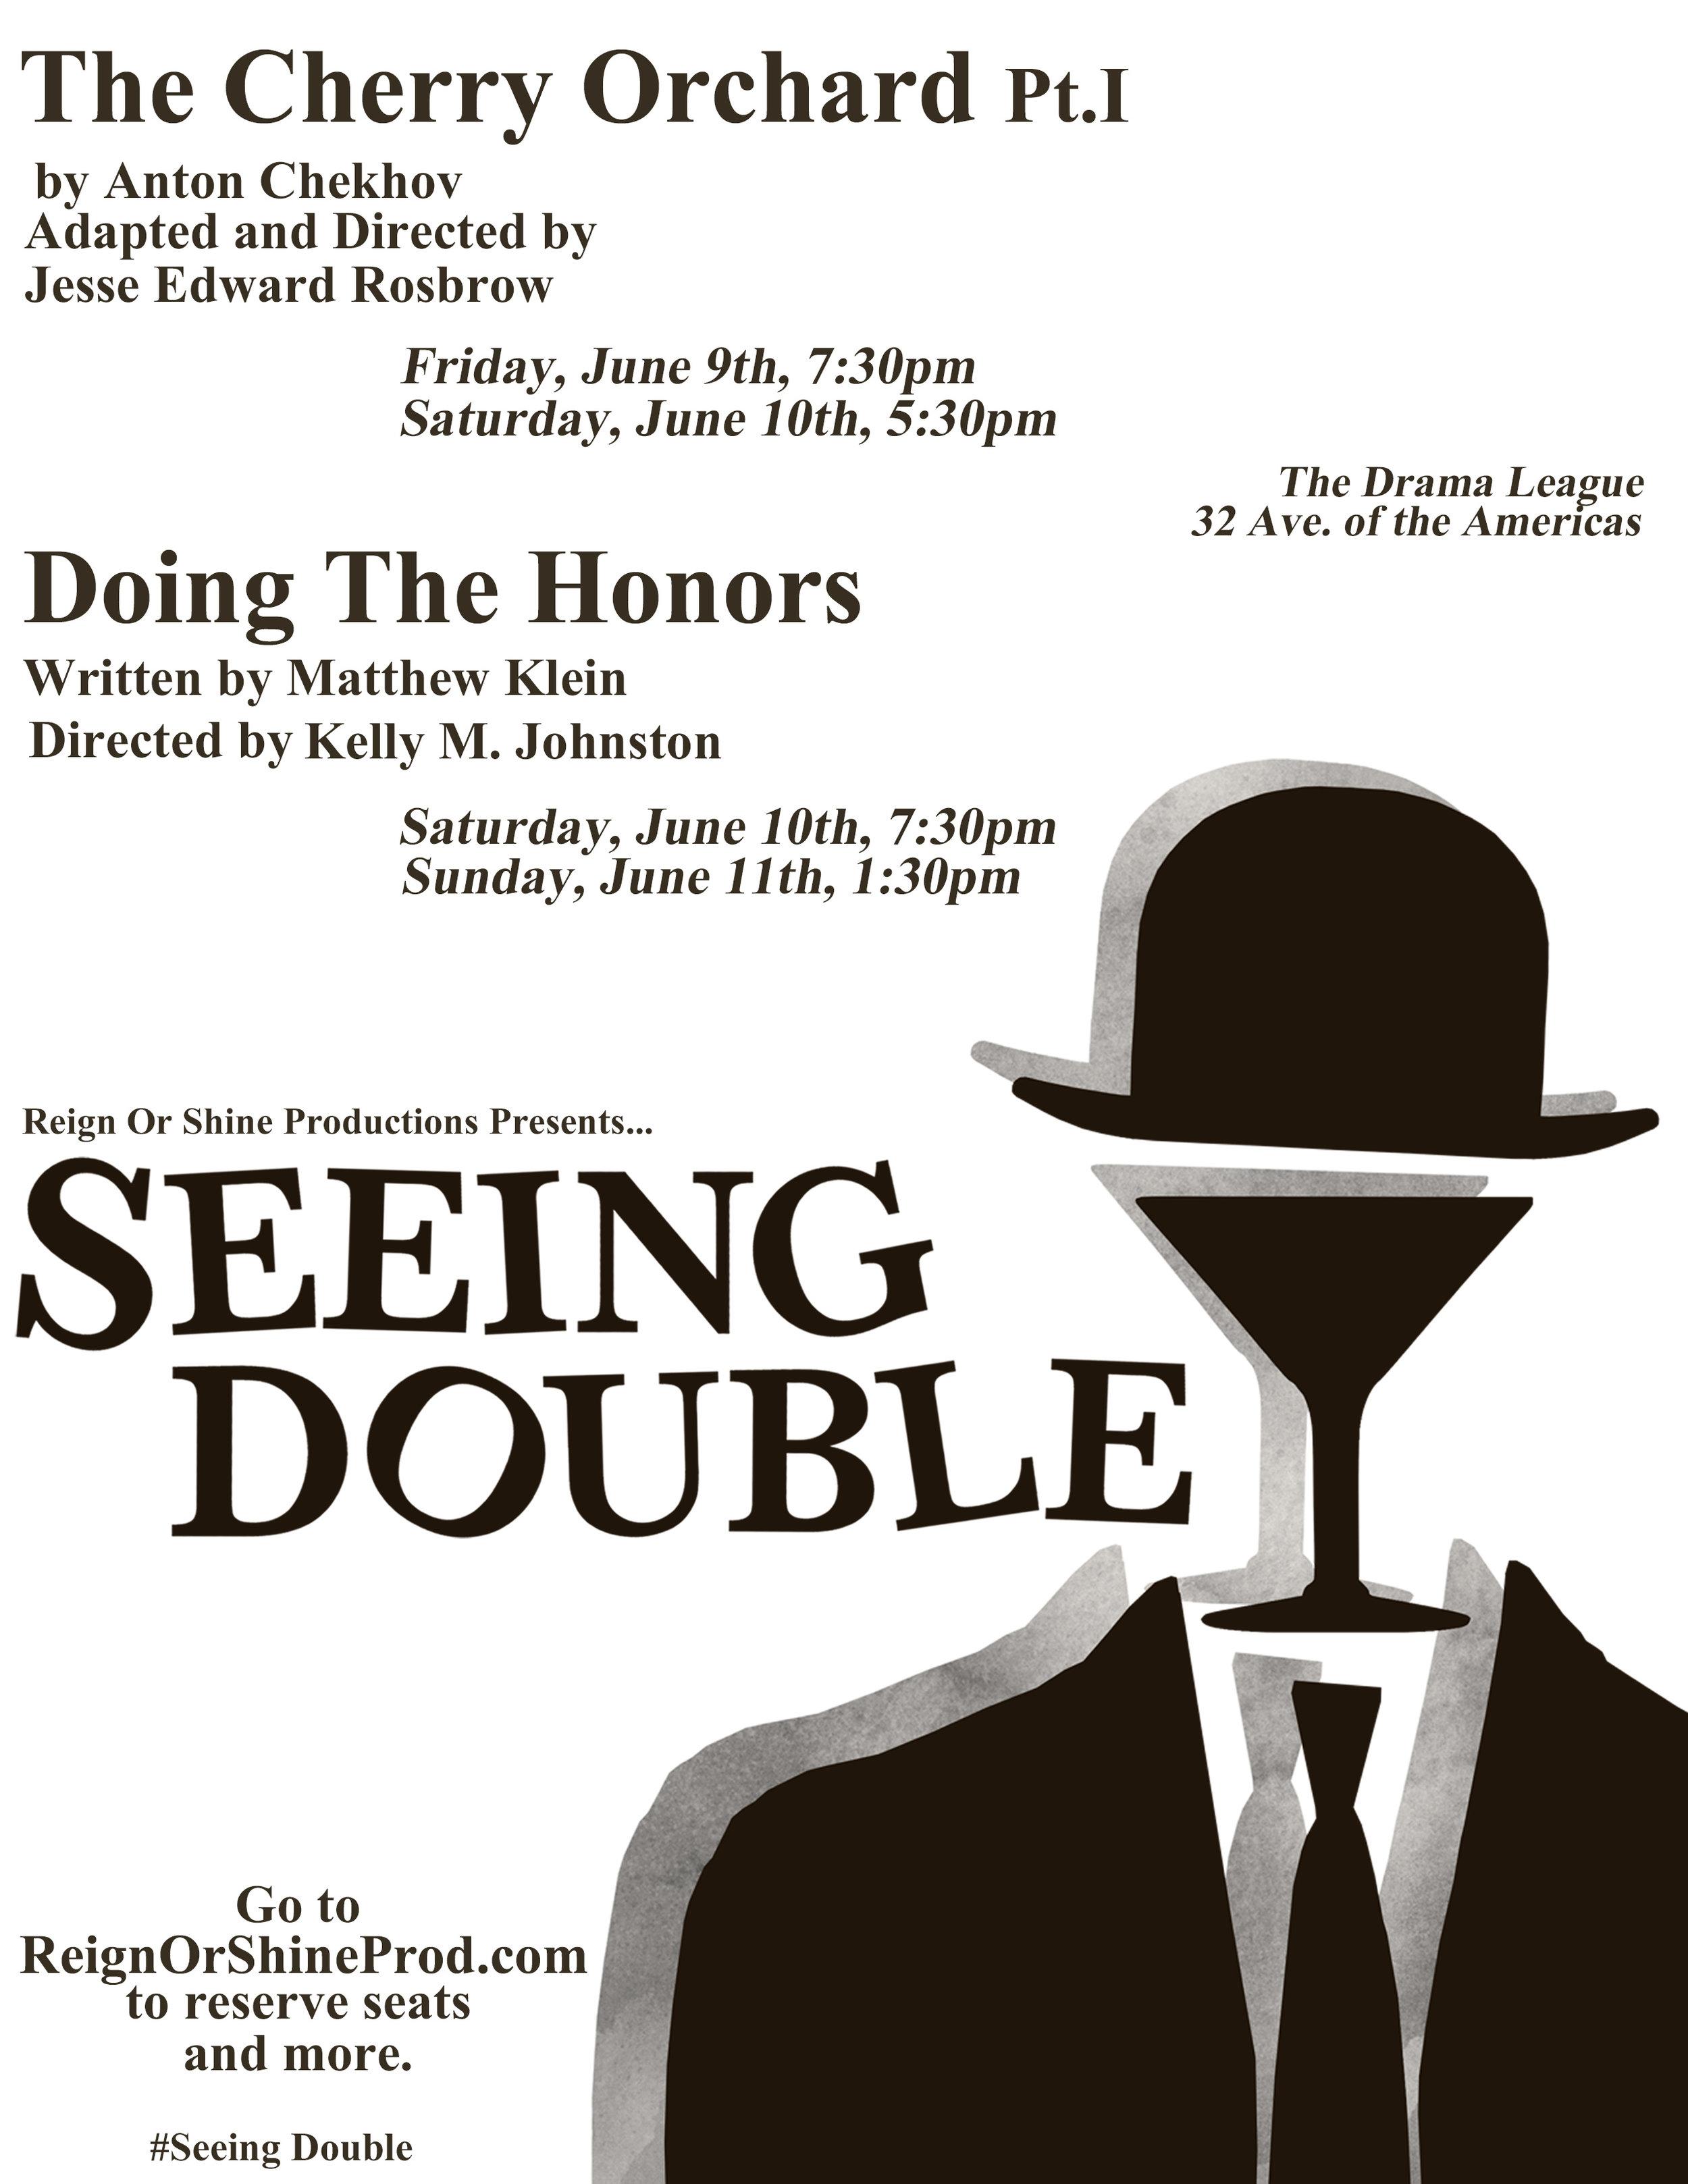 Seeing Doible Poster Designed by Lauren McCune and Lauren Hubbard